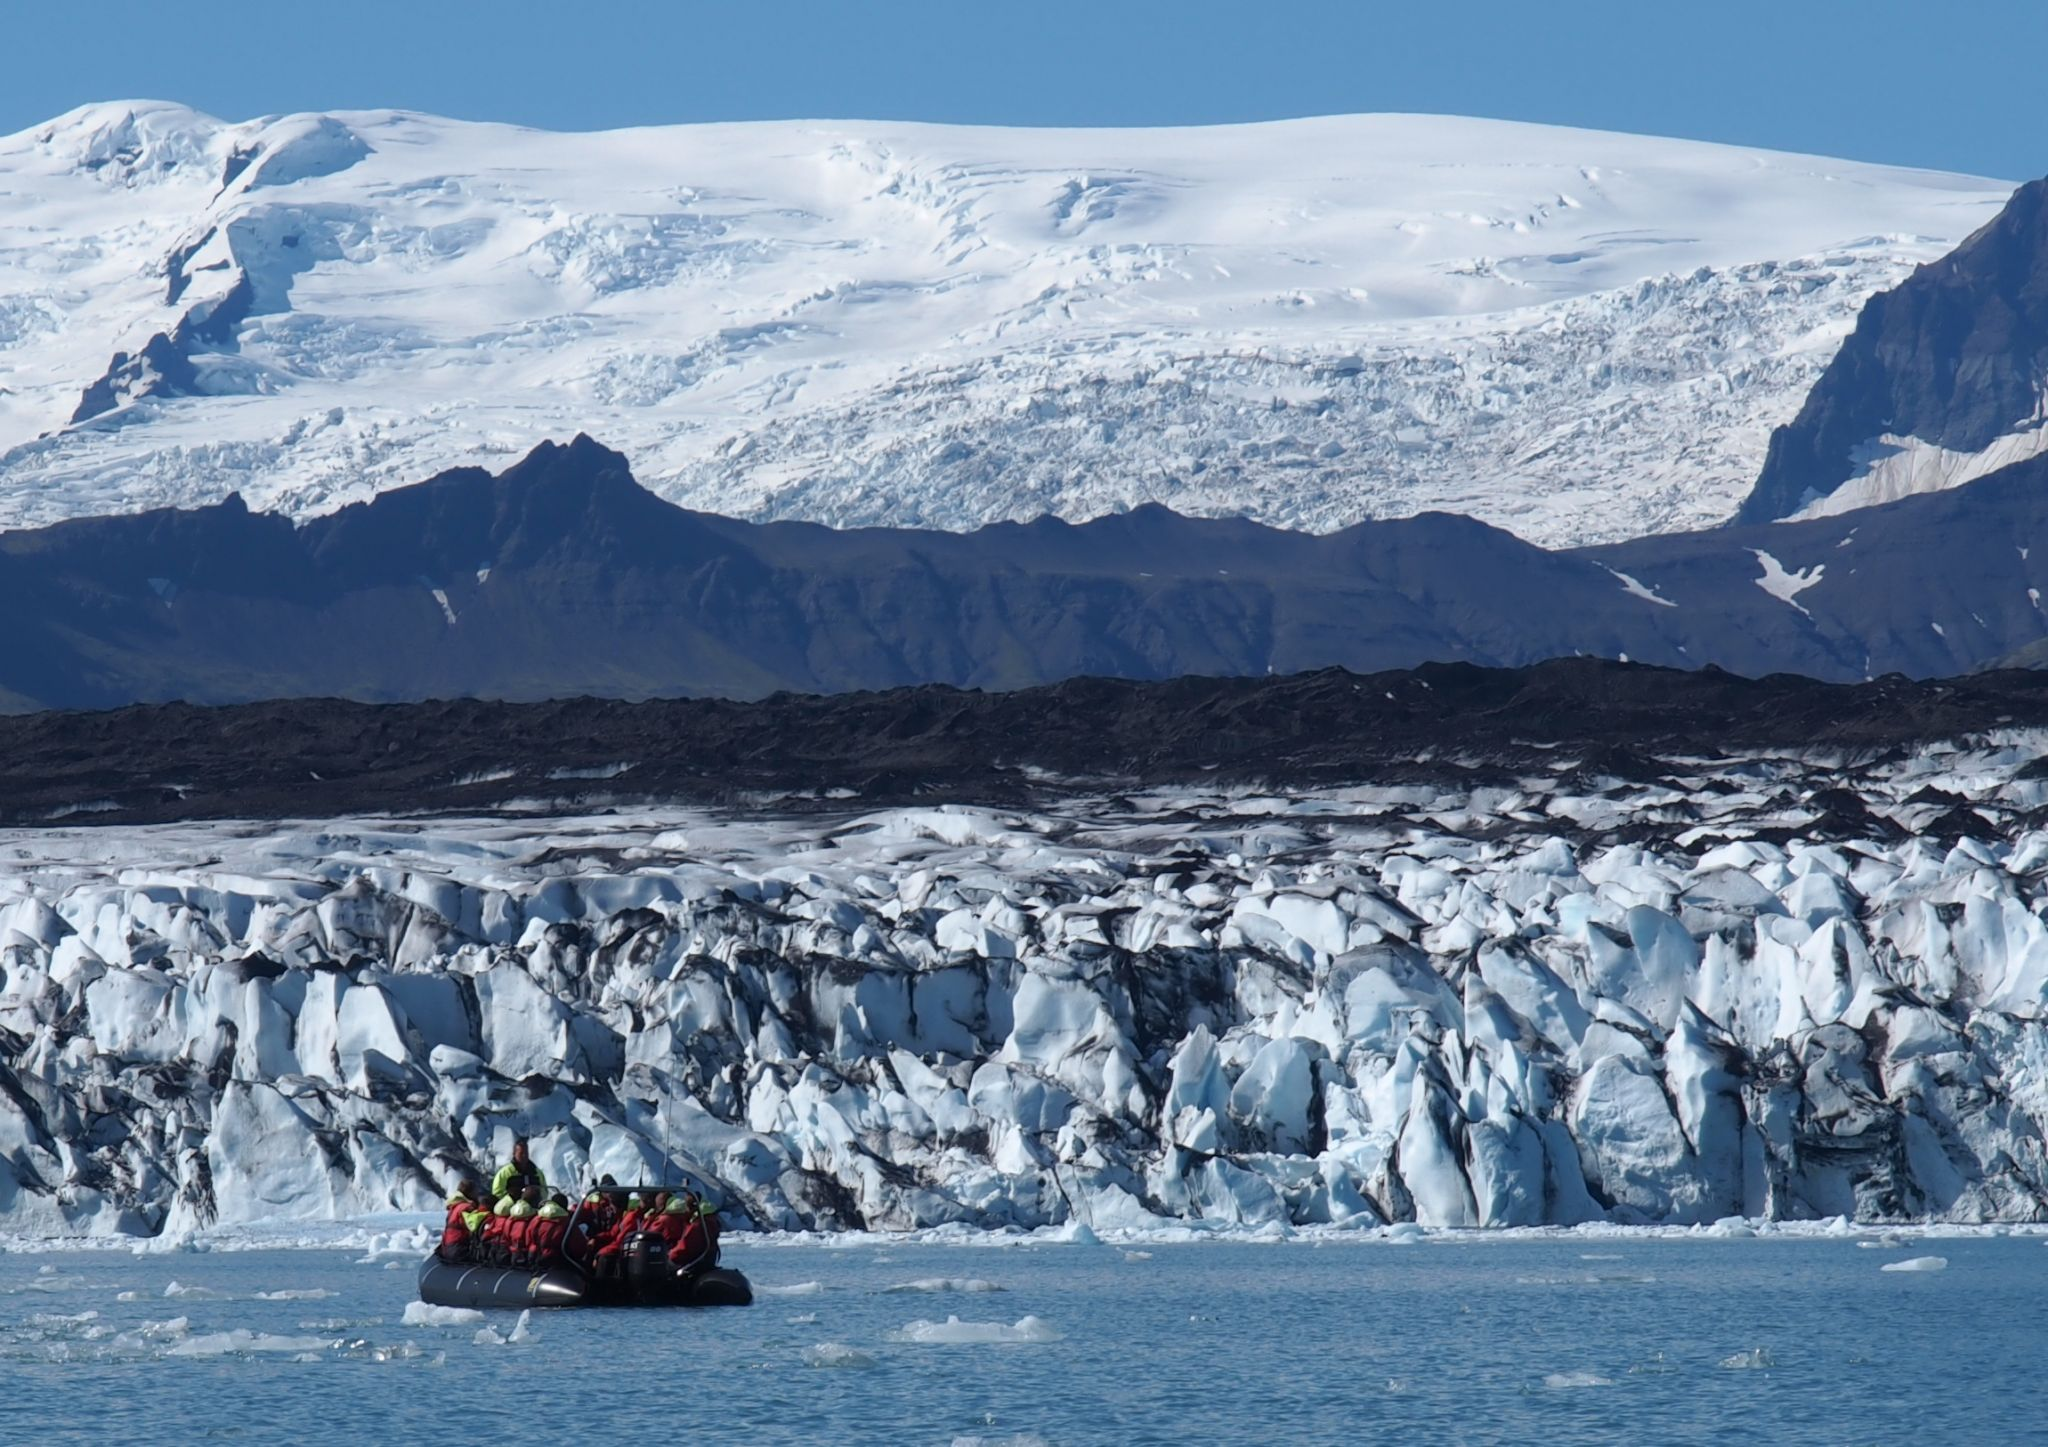 Boat Tour on Glacier Lagoon Jökulsarlon, Iceland